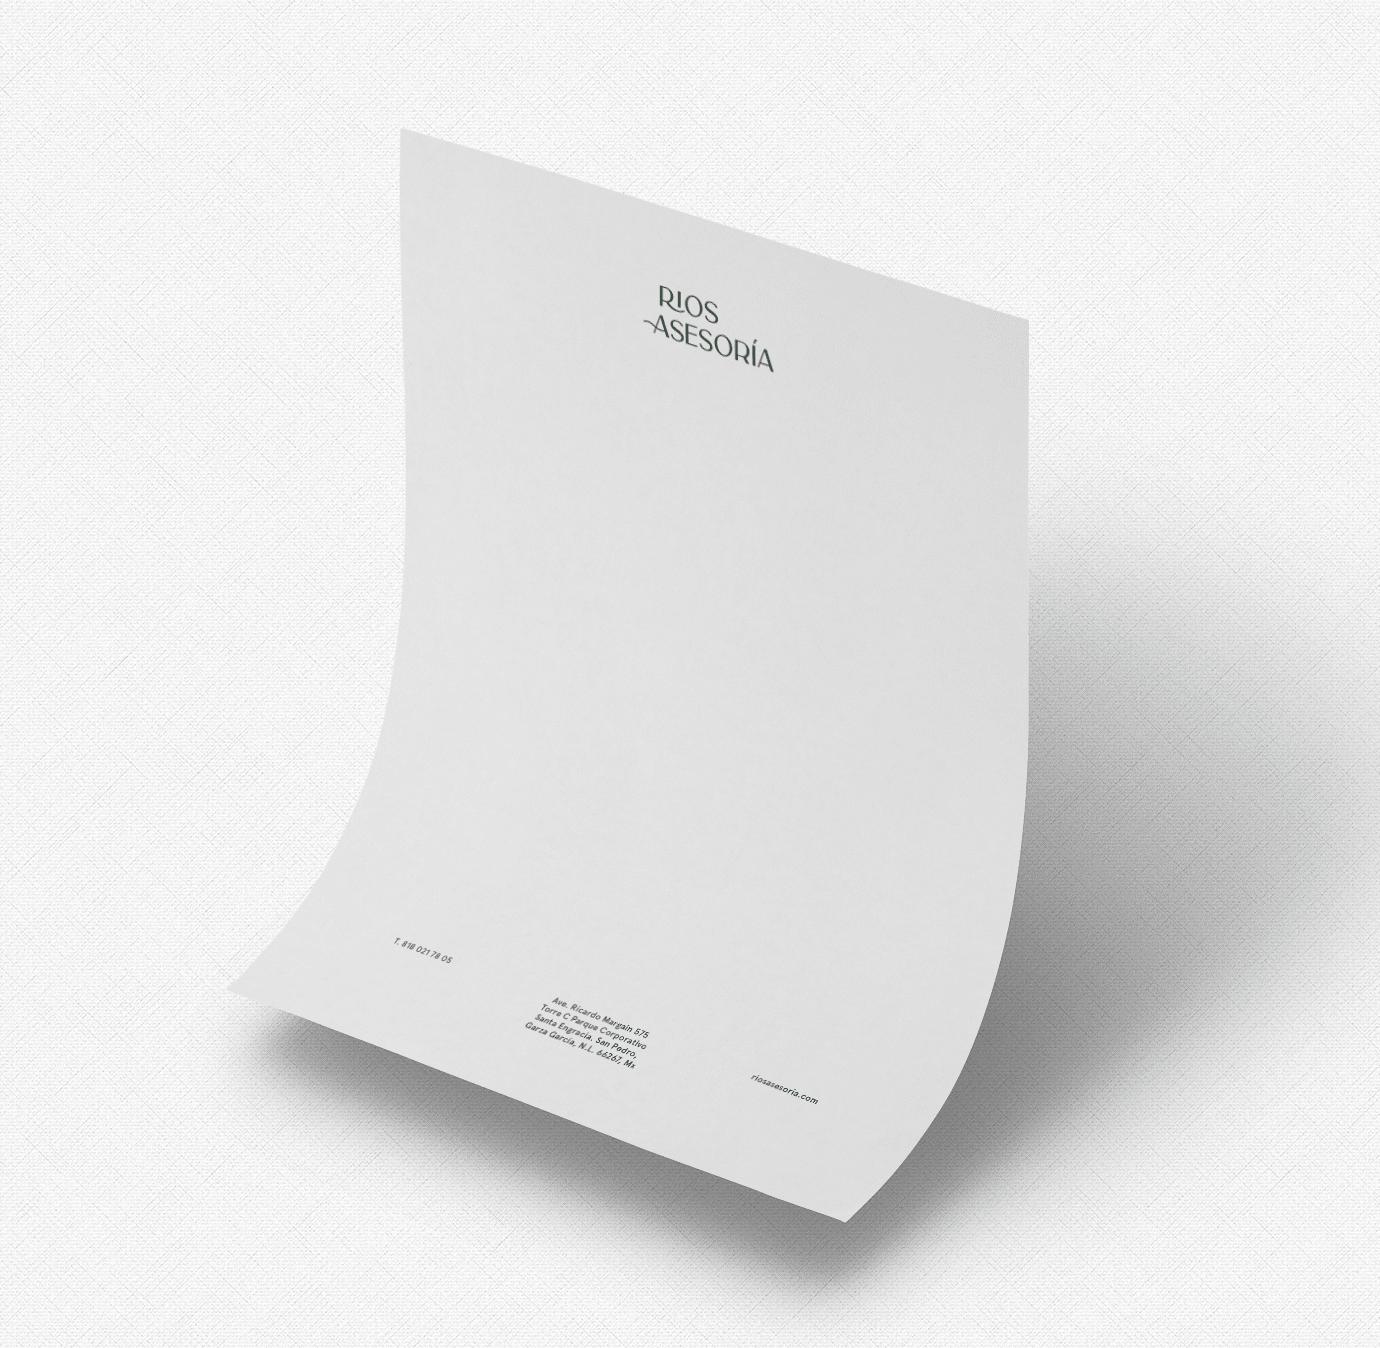 letterhead-rios-asesoria-yoenpaperland